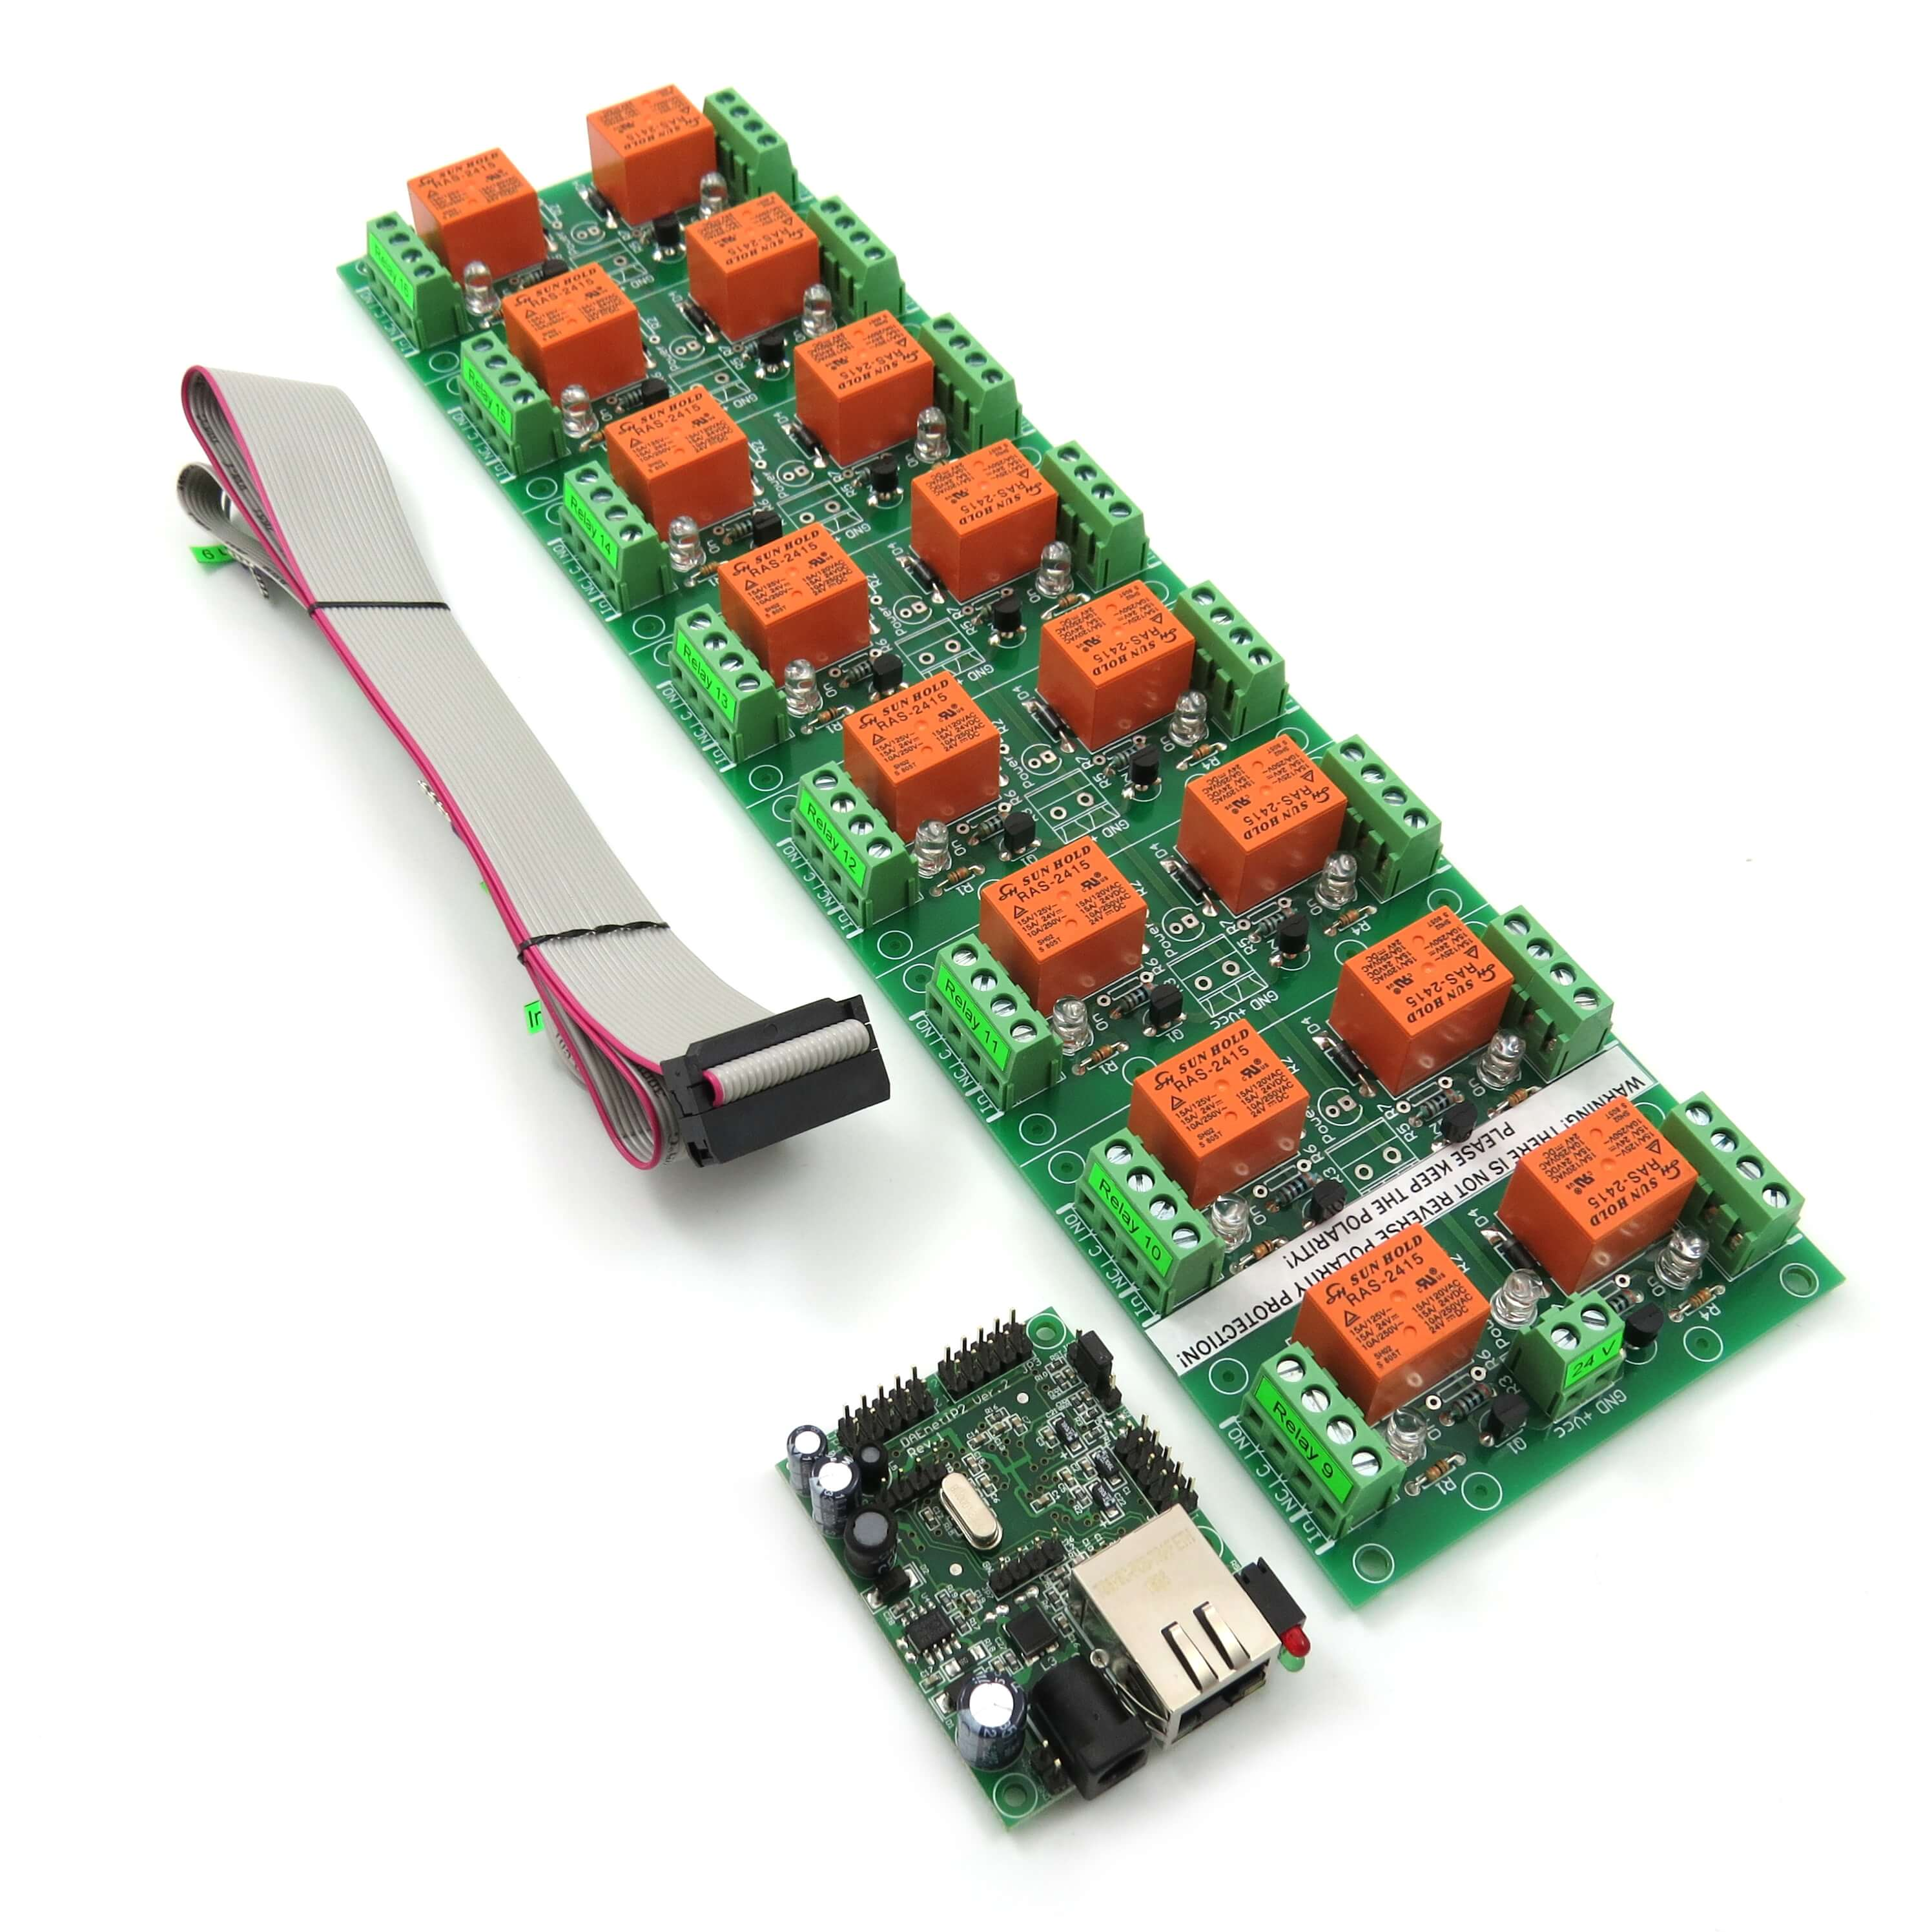 2 Channel Ethernet IP Network Relay Switch Module Internet Watchdog Remote Control Module